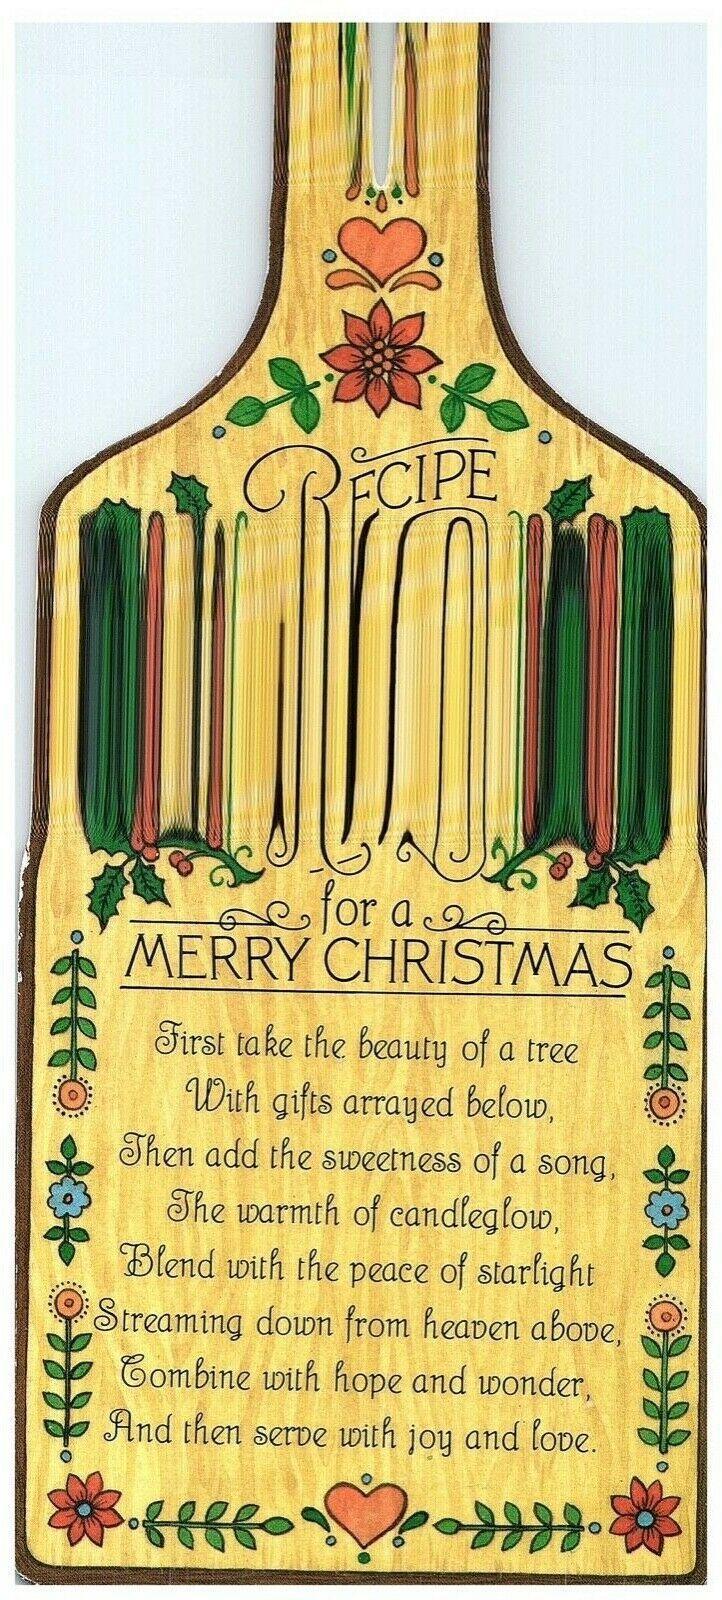 Recipe for a Merry Christmas Bottle-shaped Christmas Card Hallmark 1980  - $8.86